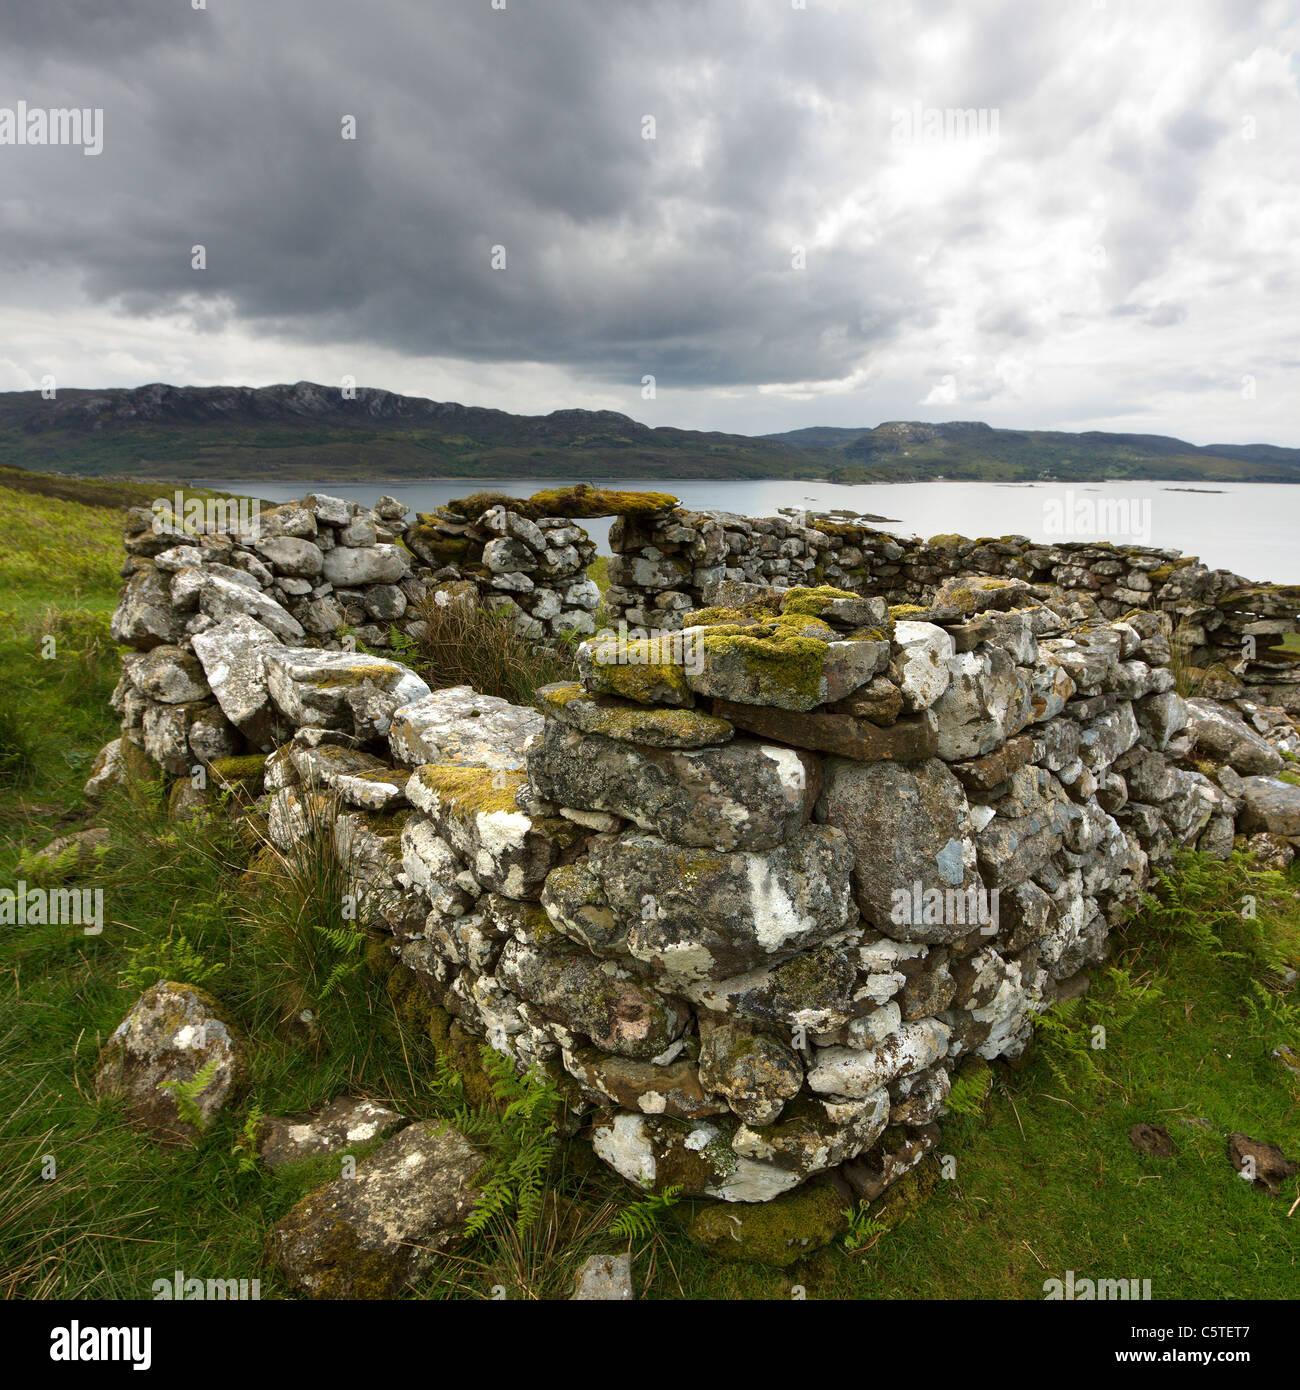 Ruined old croft building with Loch Eishort and Sleat Peninsula beyond, Boreraig, Isle of Skye, Scotland, UK - Stock Image